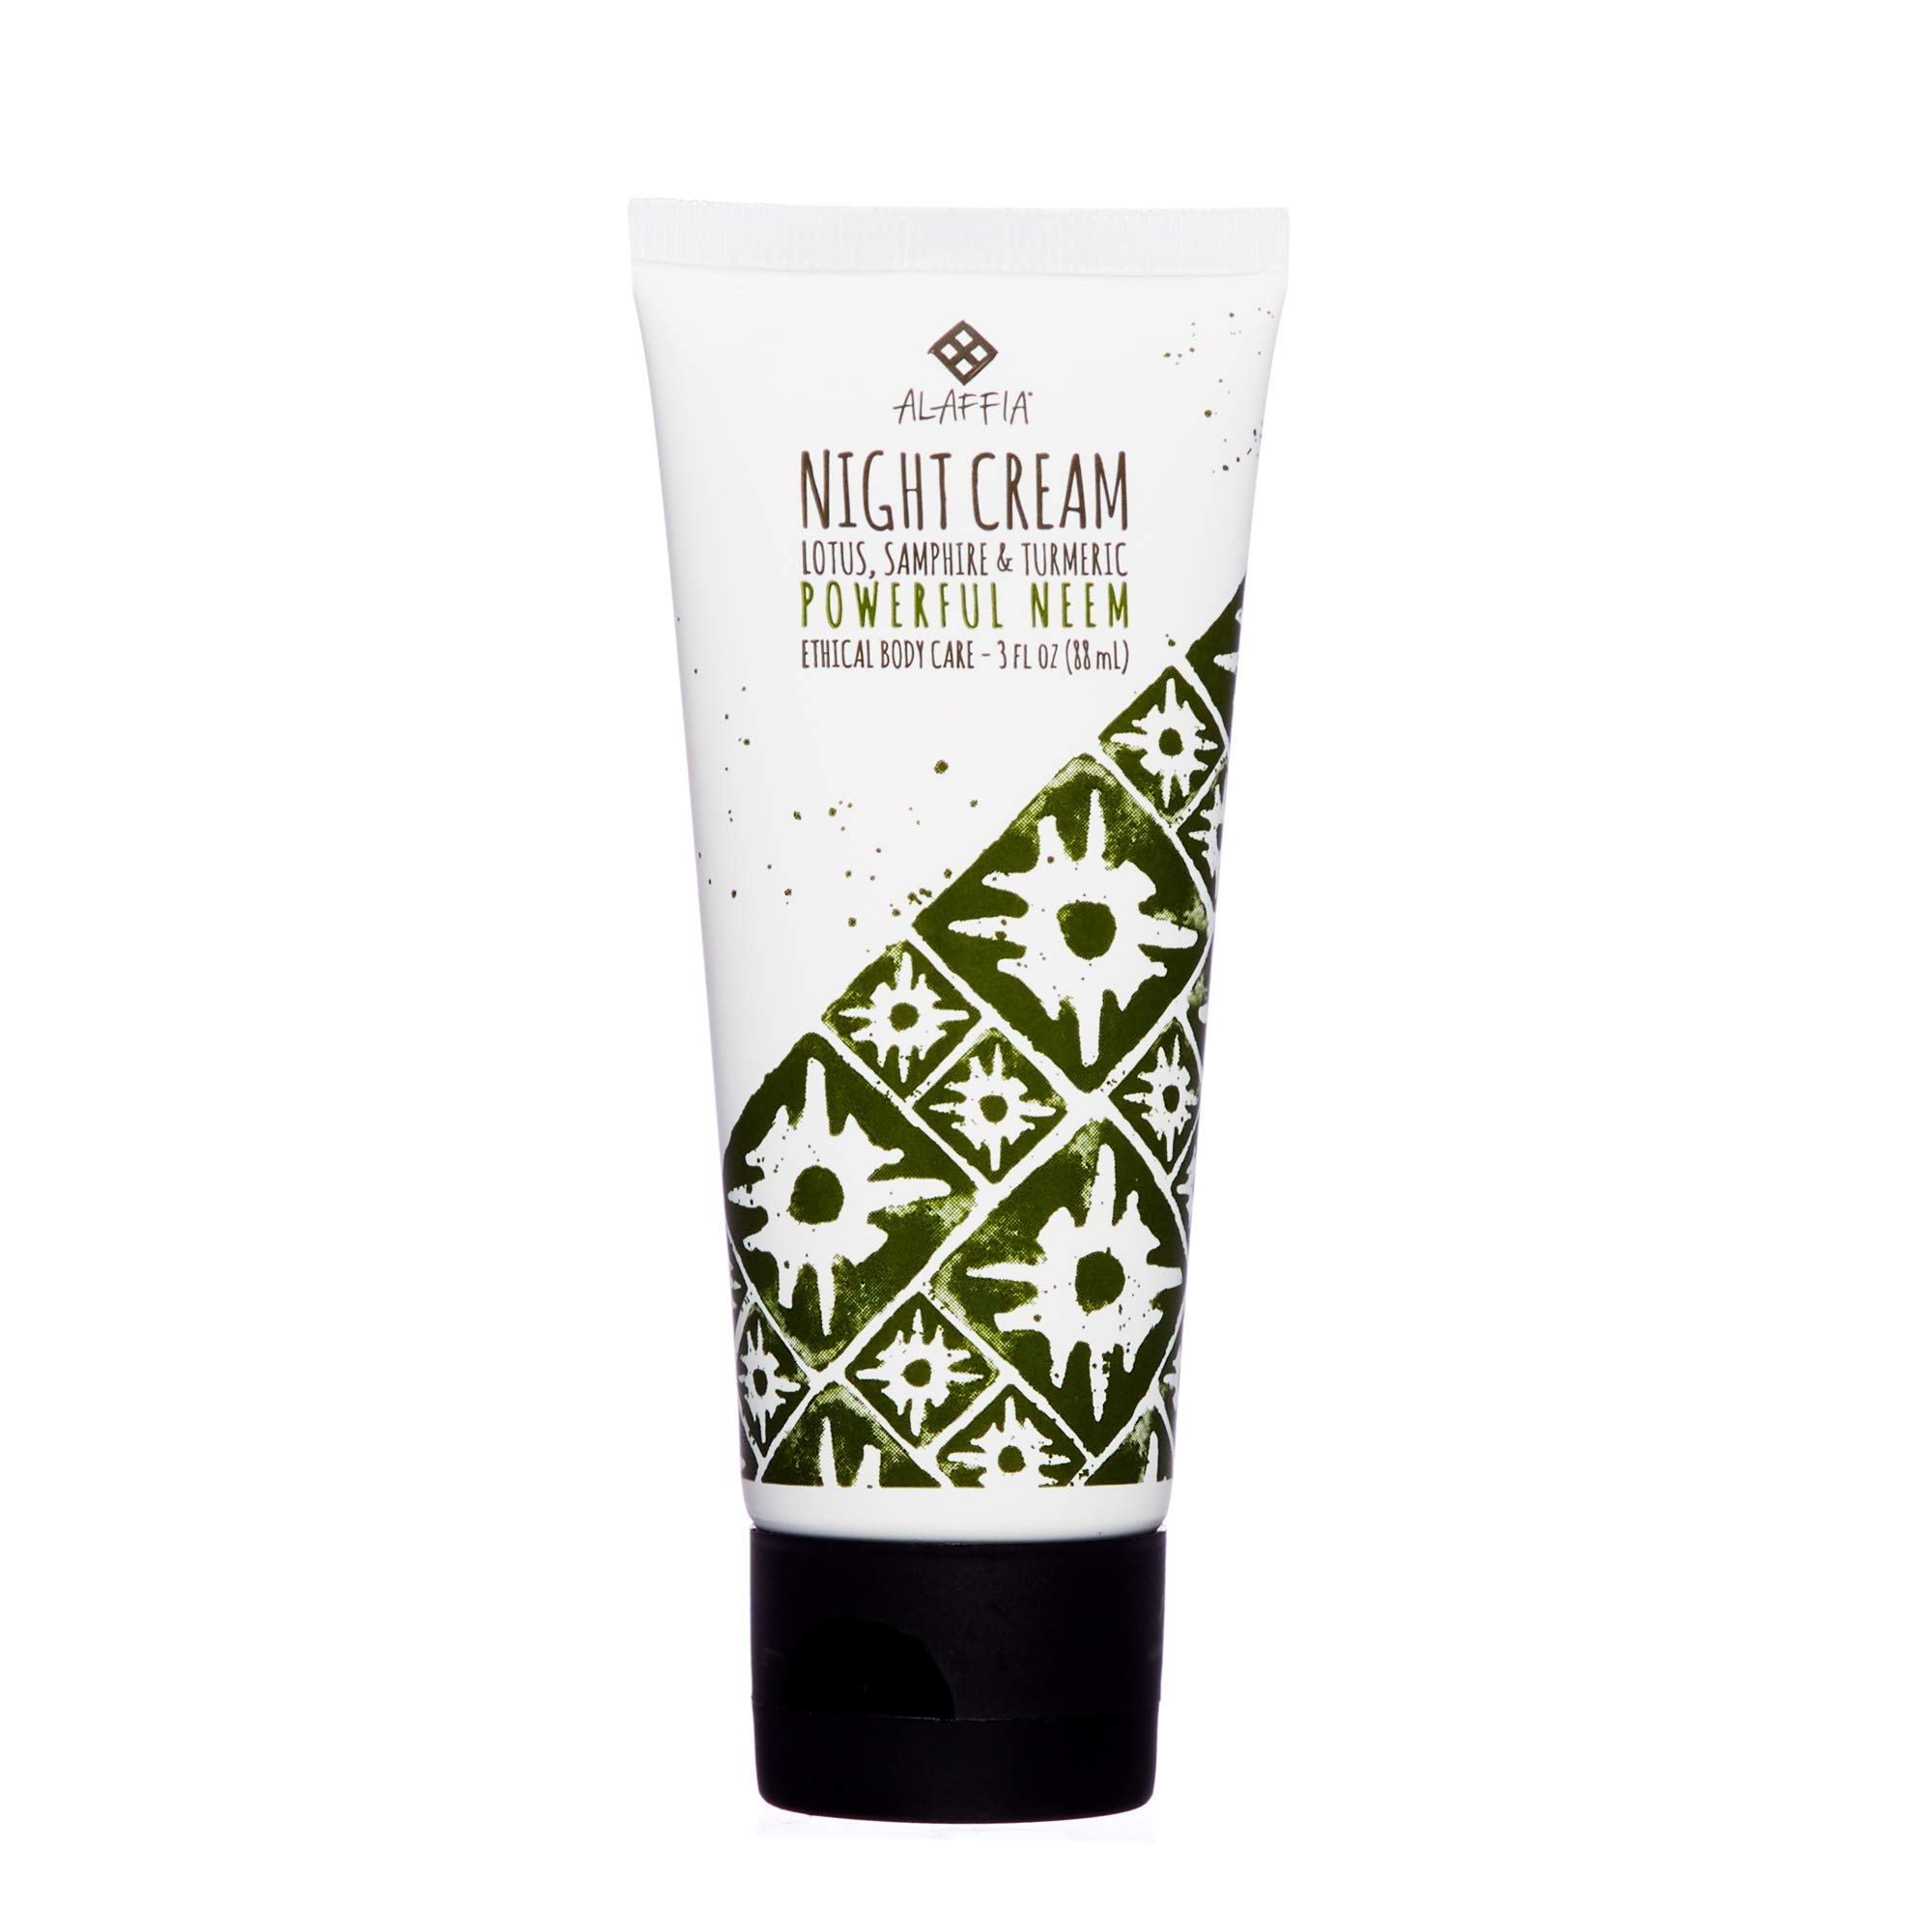 Day Cream Balancing Neem - 3 fl. oz. by Alaffia (pack of 6) 3 Pack - EOS Smooth Lip Balm Sphere, Lemon Drop 0.25 oz